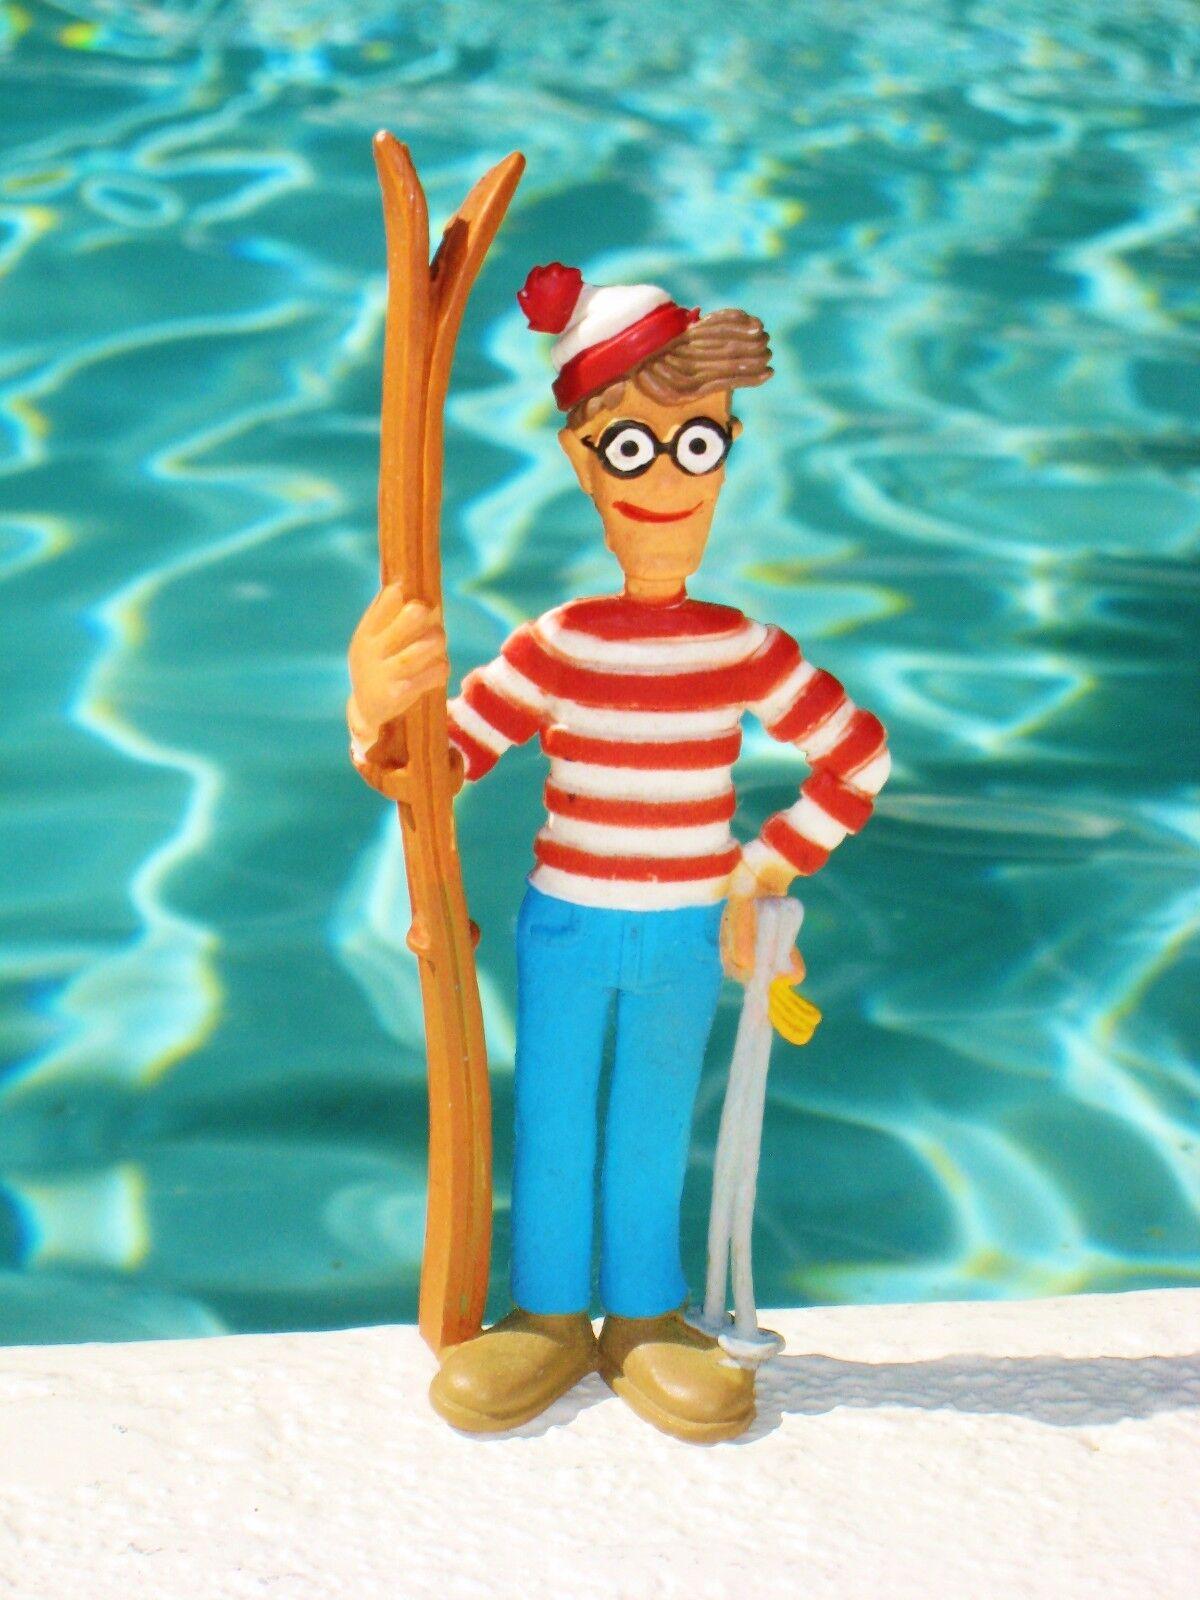 VINTAGE WHERE'S WALDO PVC FIGURE MARTIN HANDFORD W  SKIS 4'' toy figure - 1992